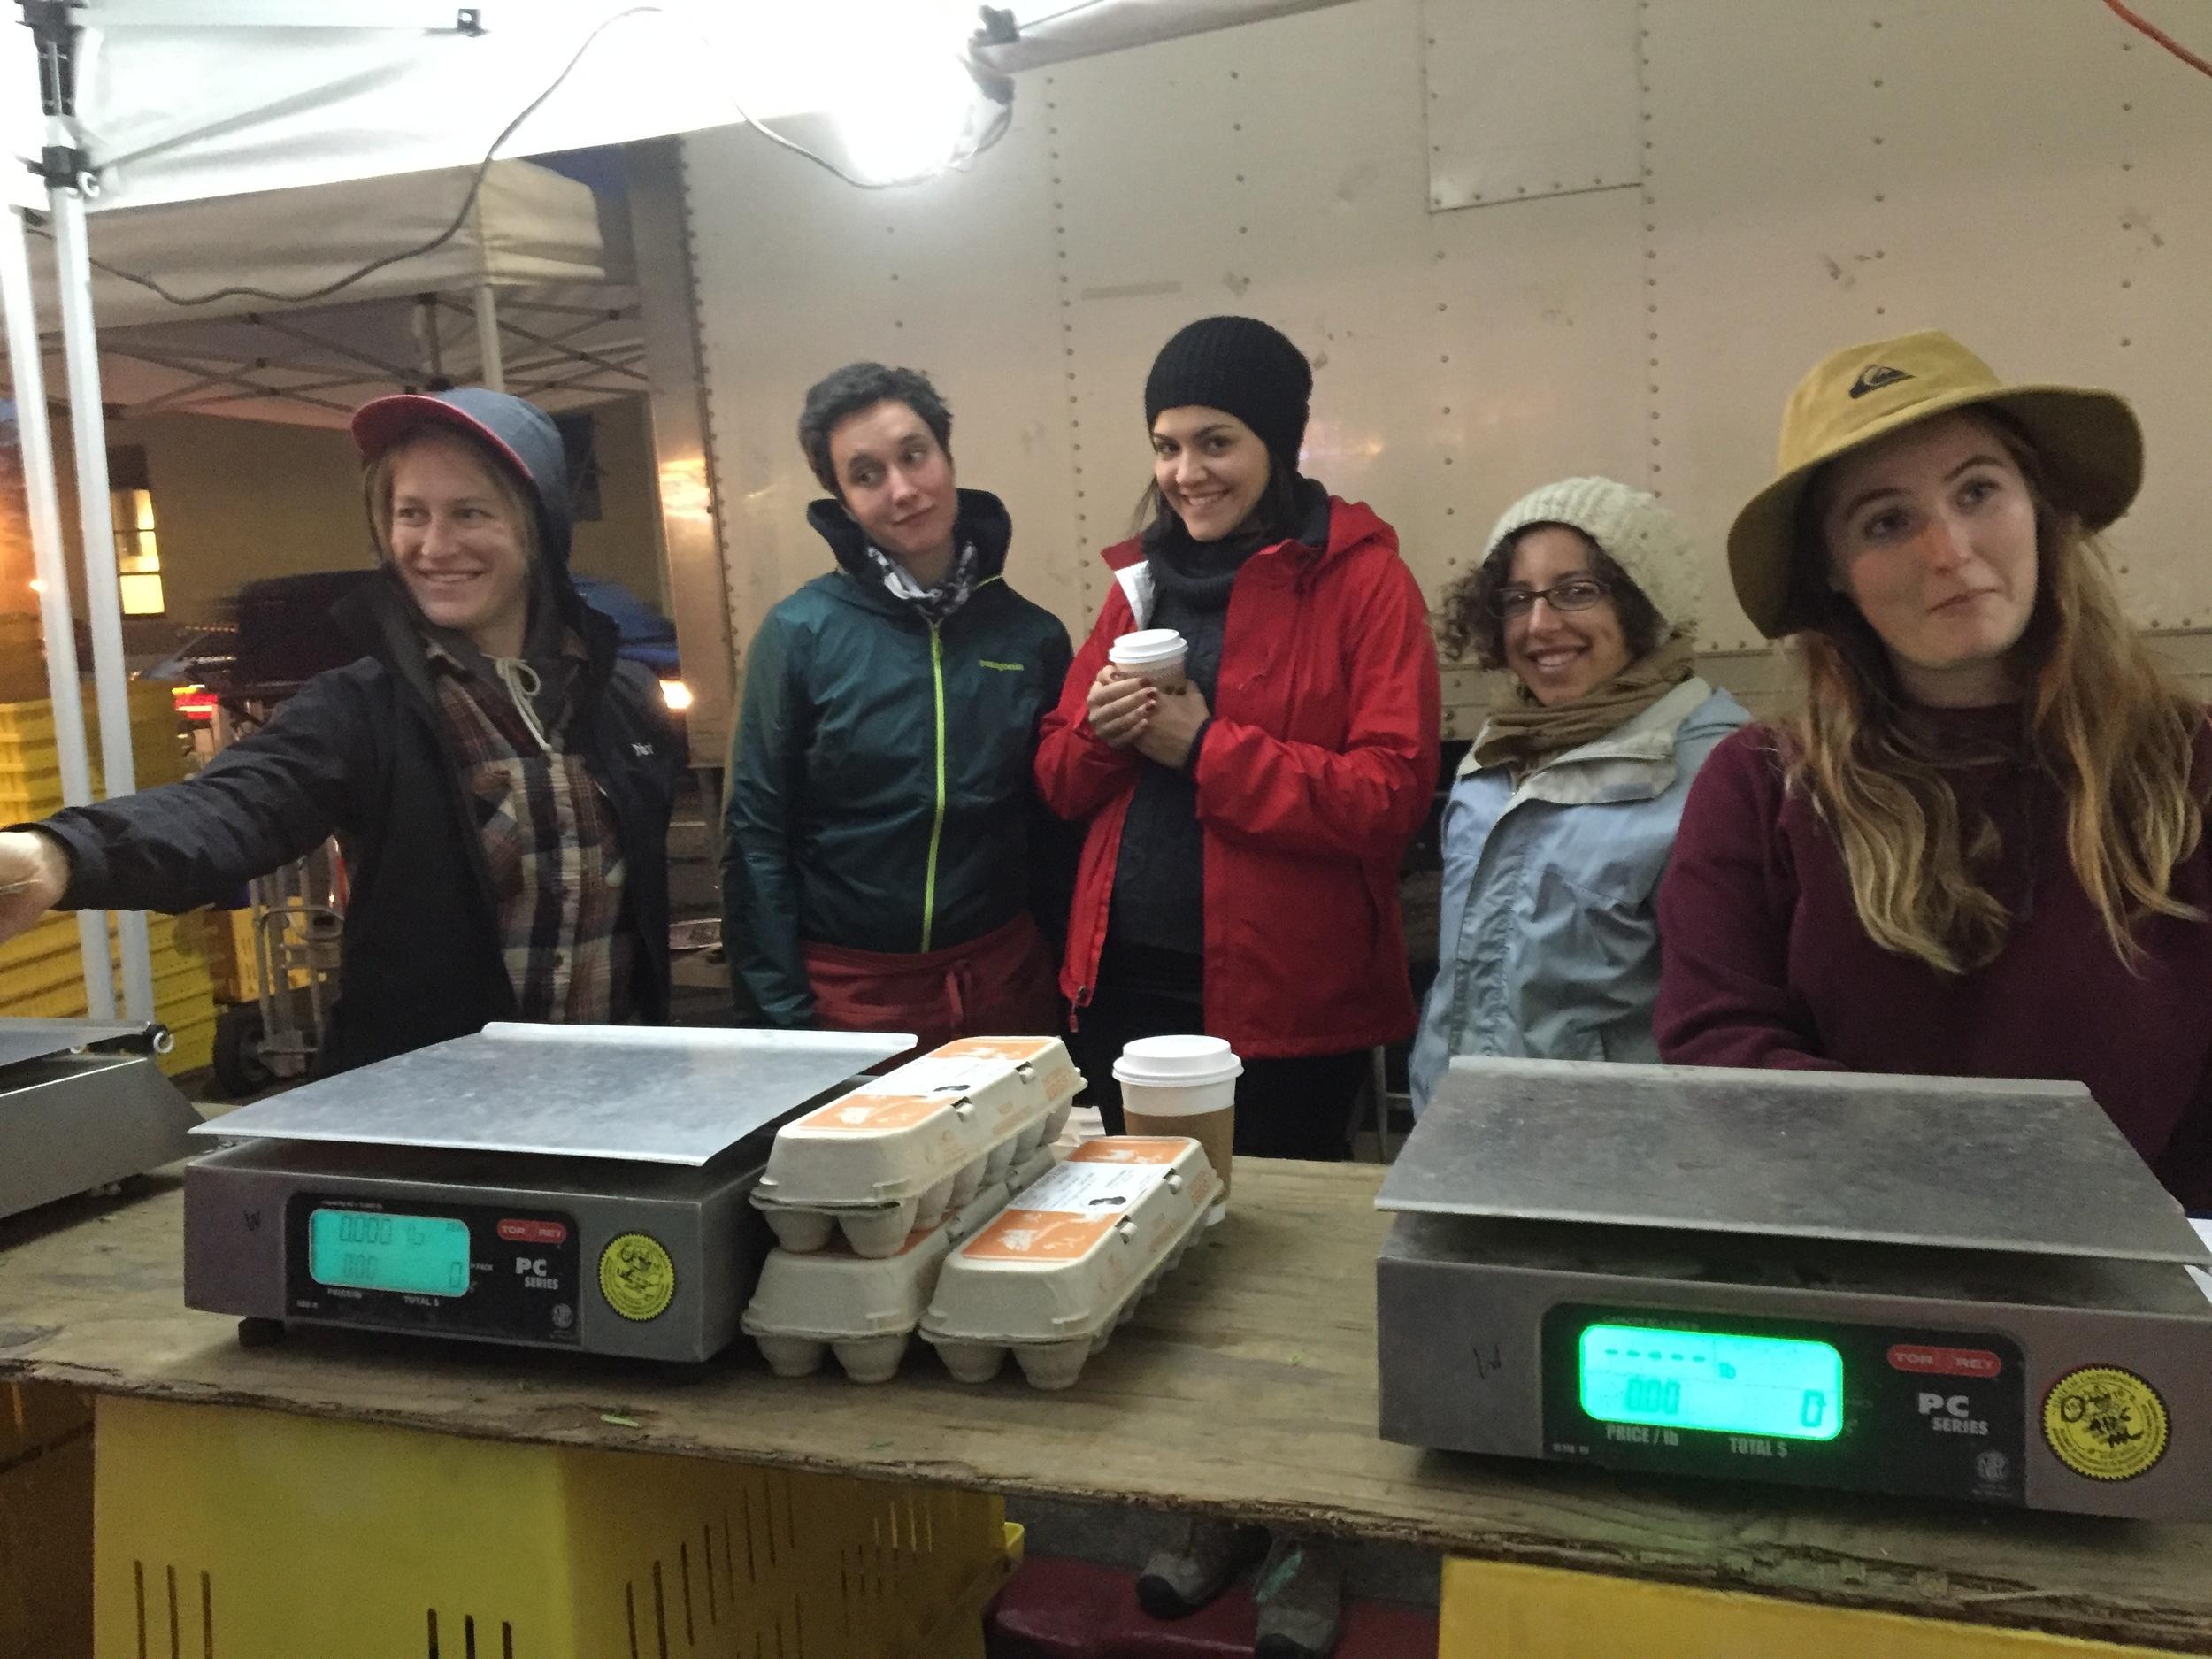 Thursday market crew, there rain or shine!